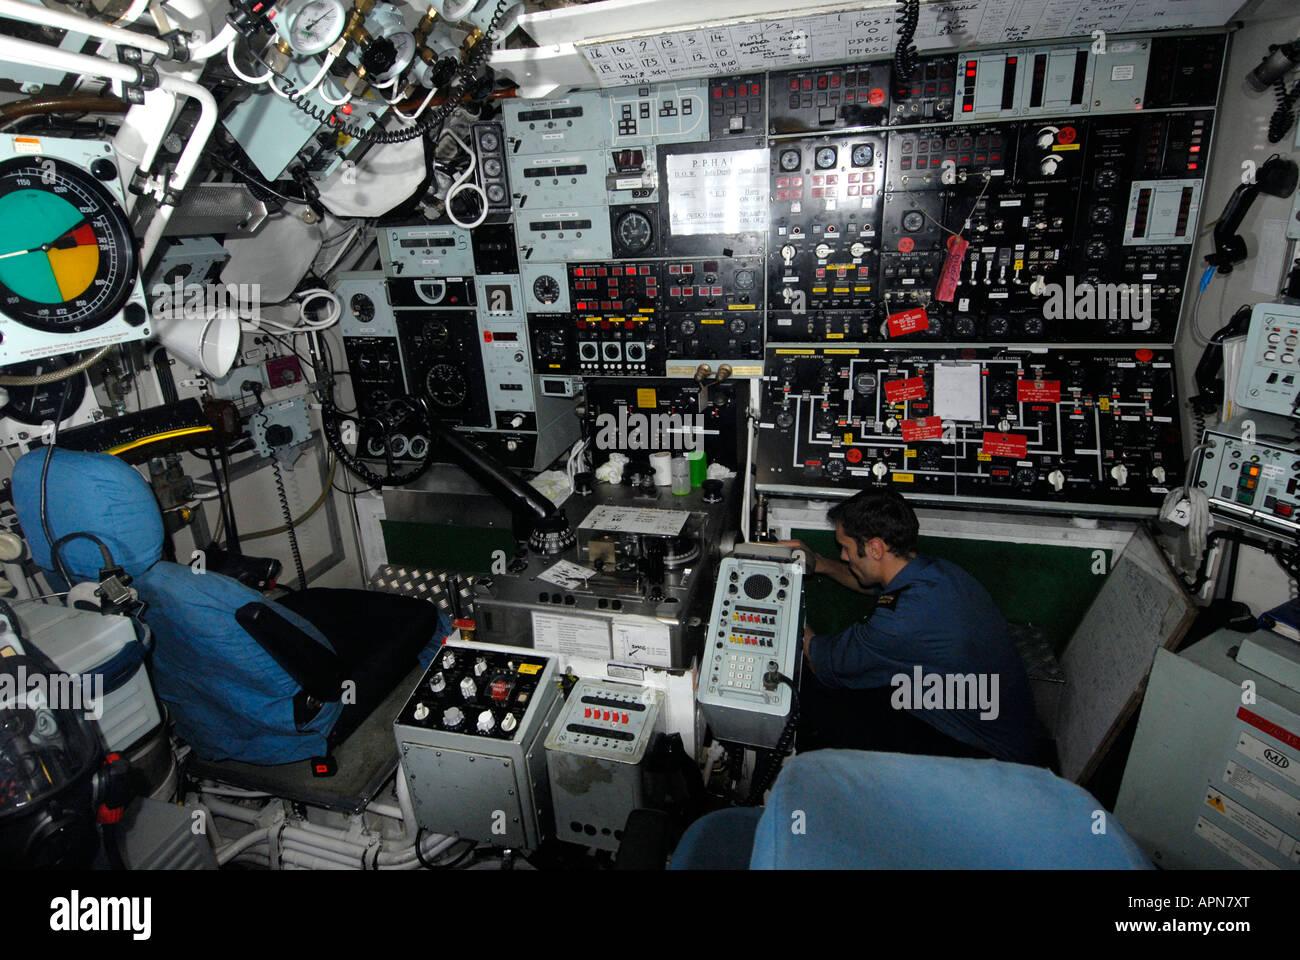 Submarino nuclear HMS Tireless (S88) de la sala de control principal Imagen De Stock